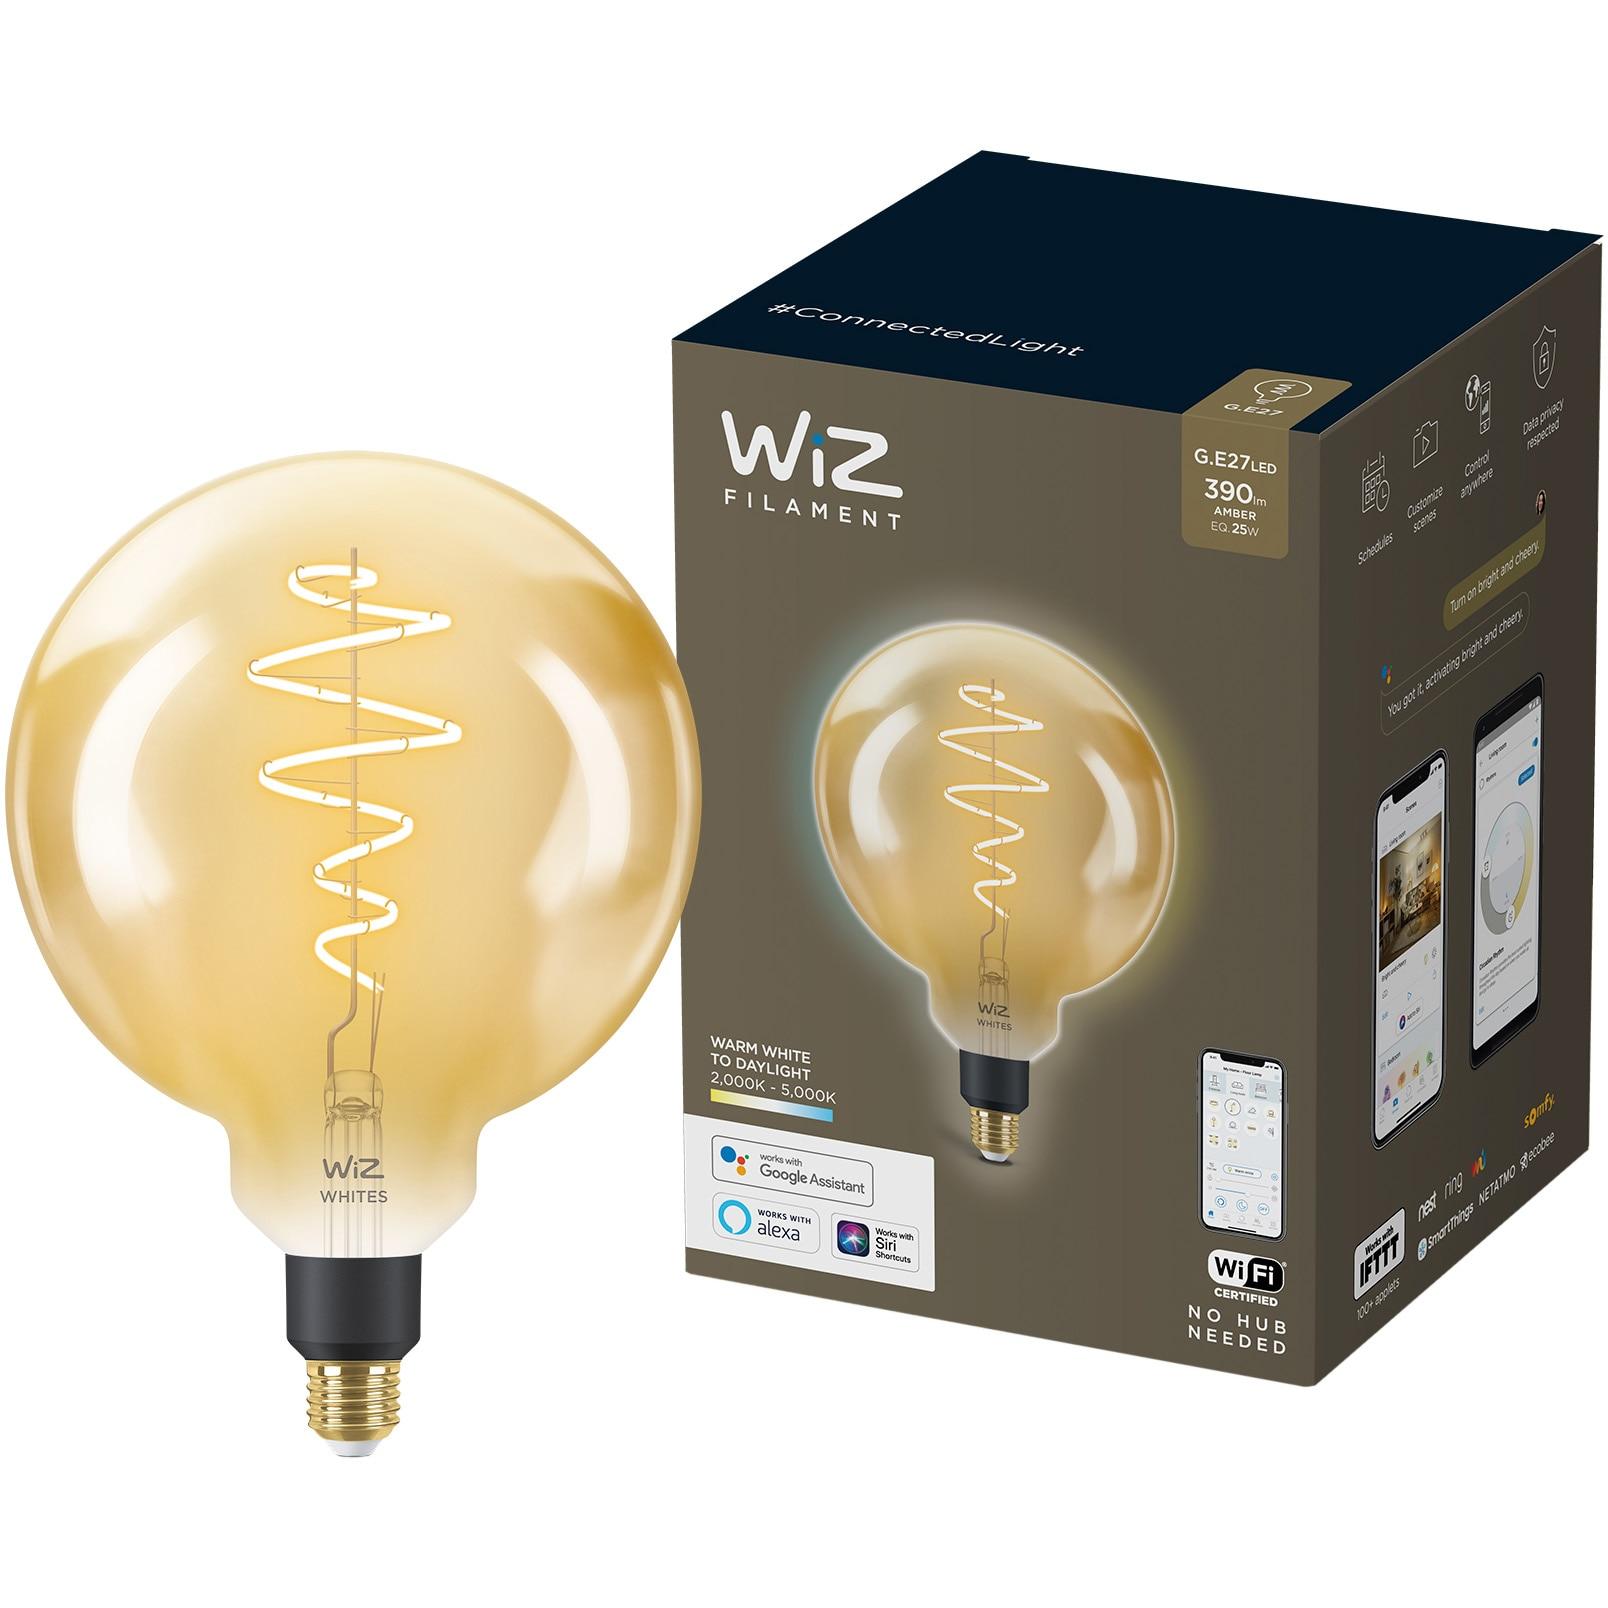 Fotografie Bec LED inteligent vintage (decorativ) WiZ Connected Filament Whites, Wi-Fi, G200, E27, 6.5W (25W), 390 lm, temperatura lumina reglabila (2000K-5000K), compatibil Google Assistant/Alexa/Siri